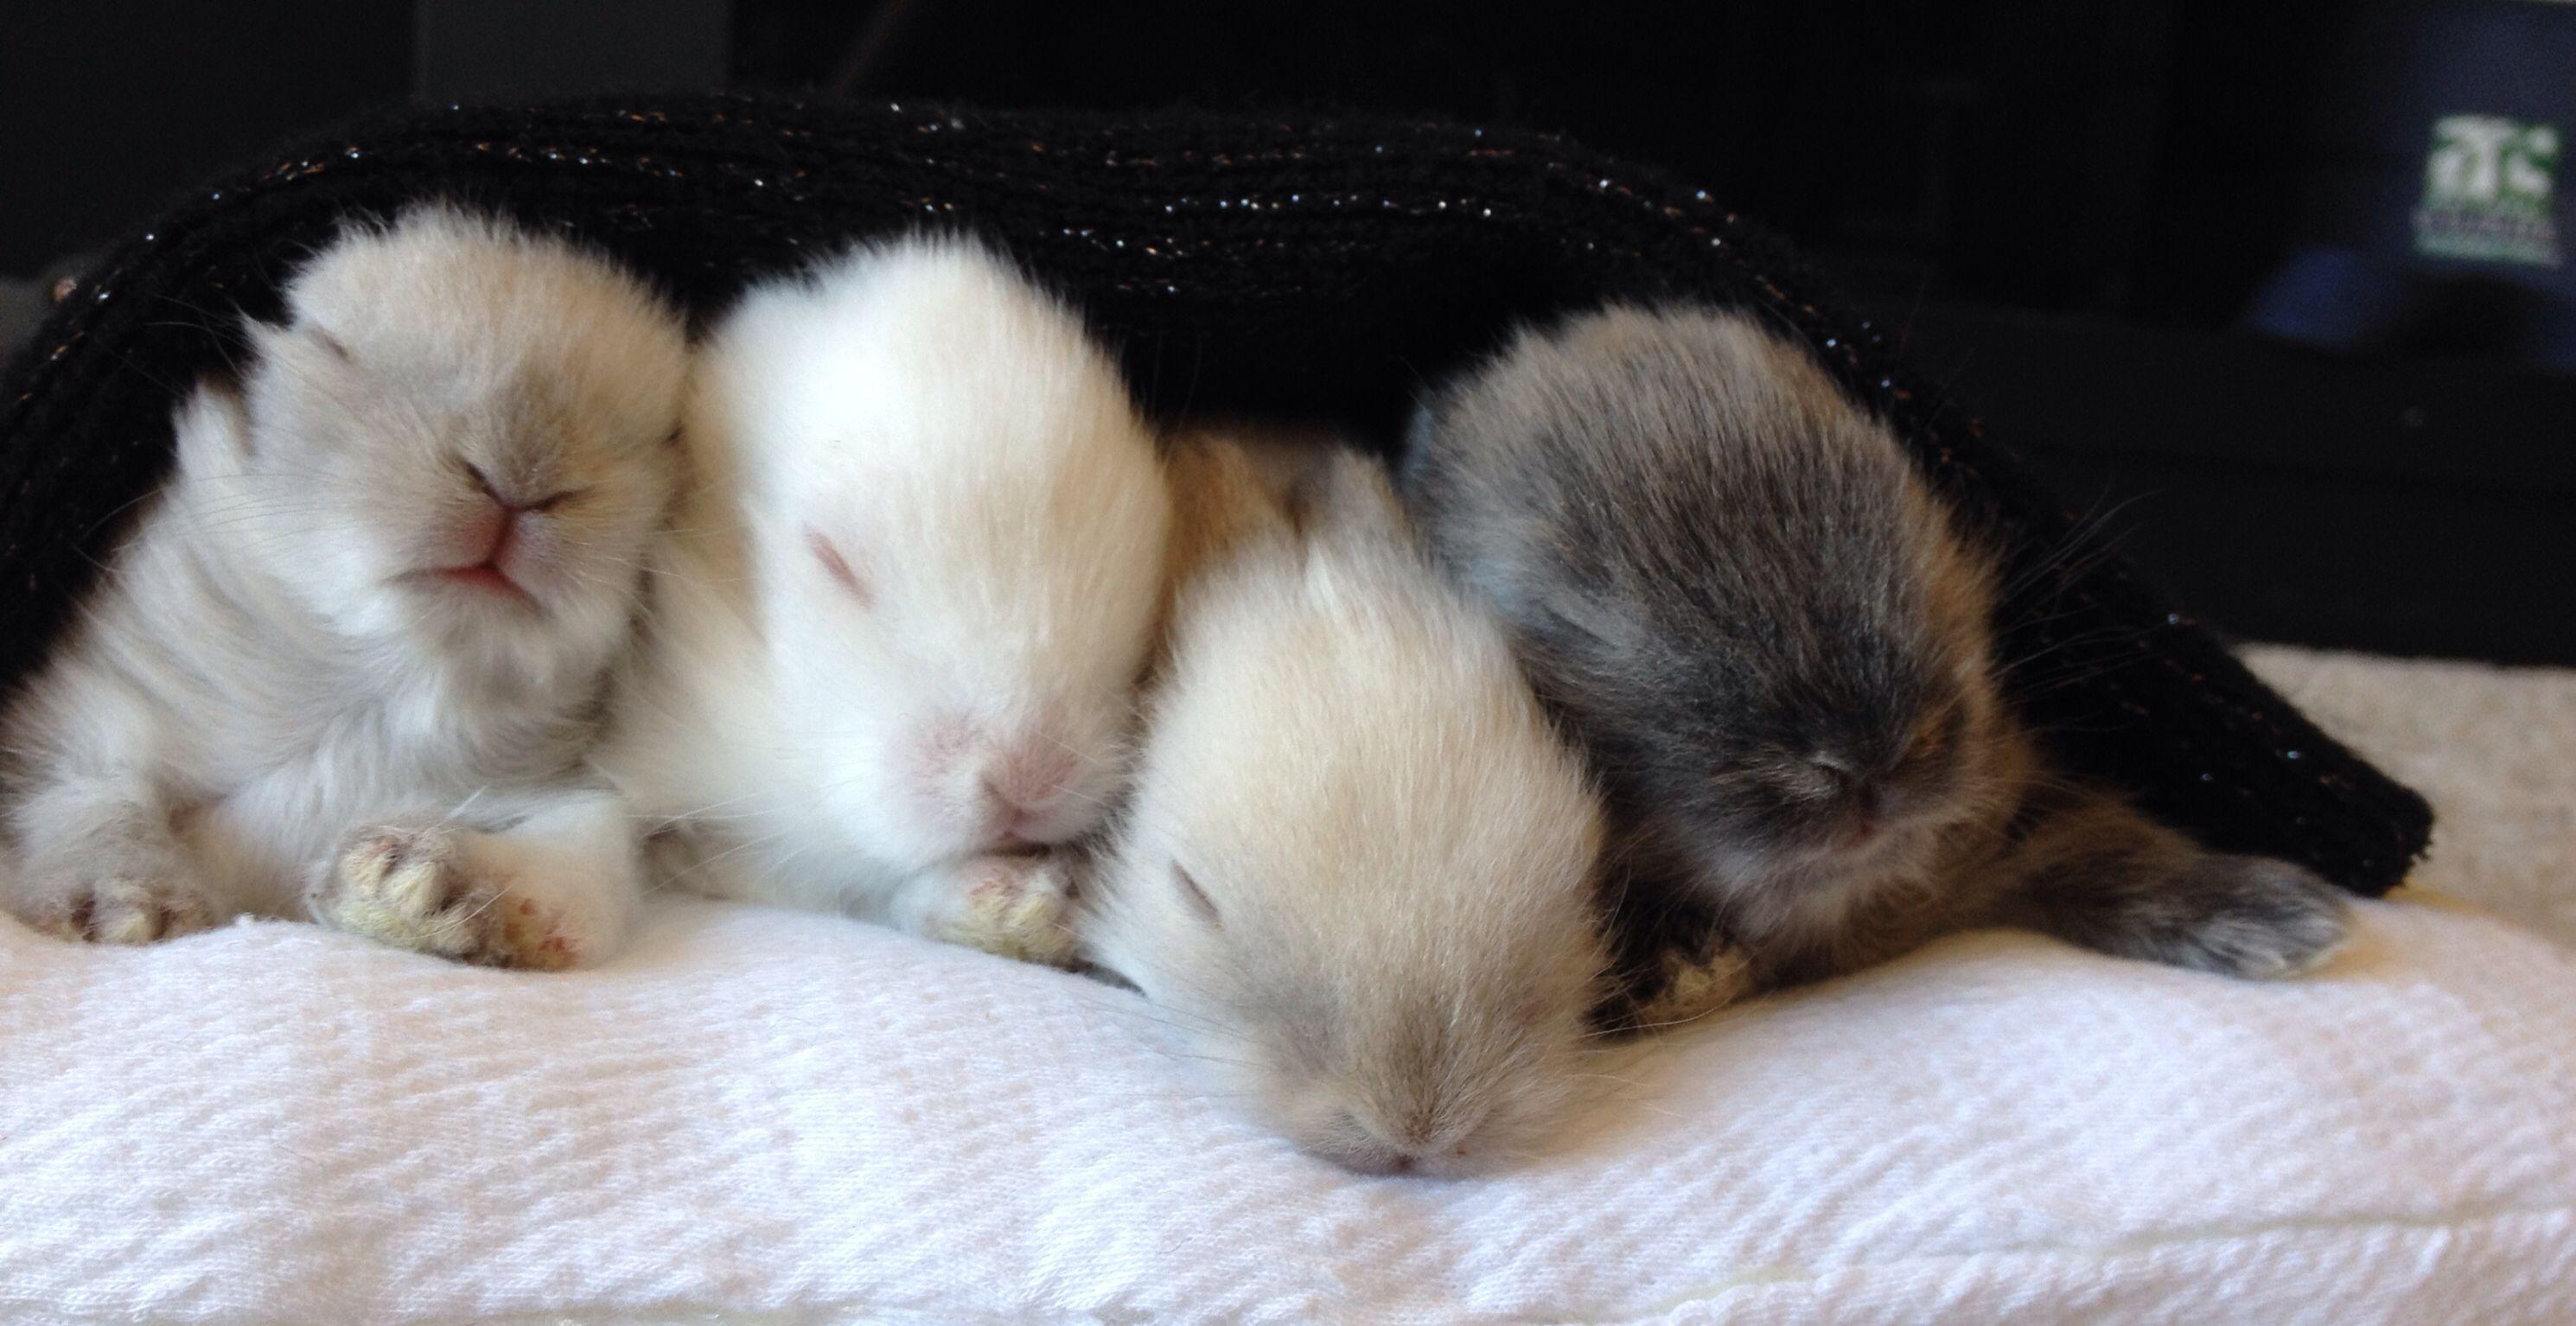 Baby lionhead bunny rabbit sleeping | Bunnies | Pinterest